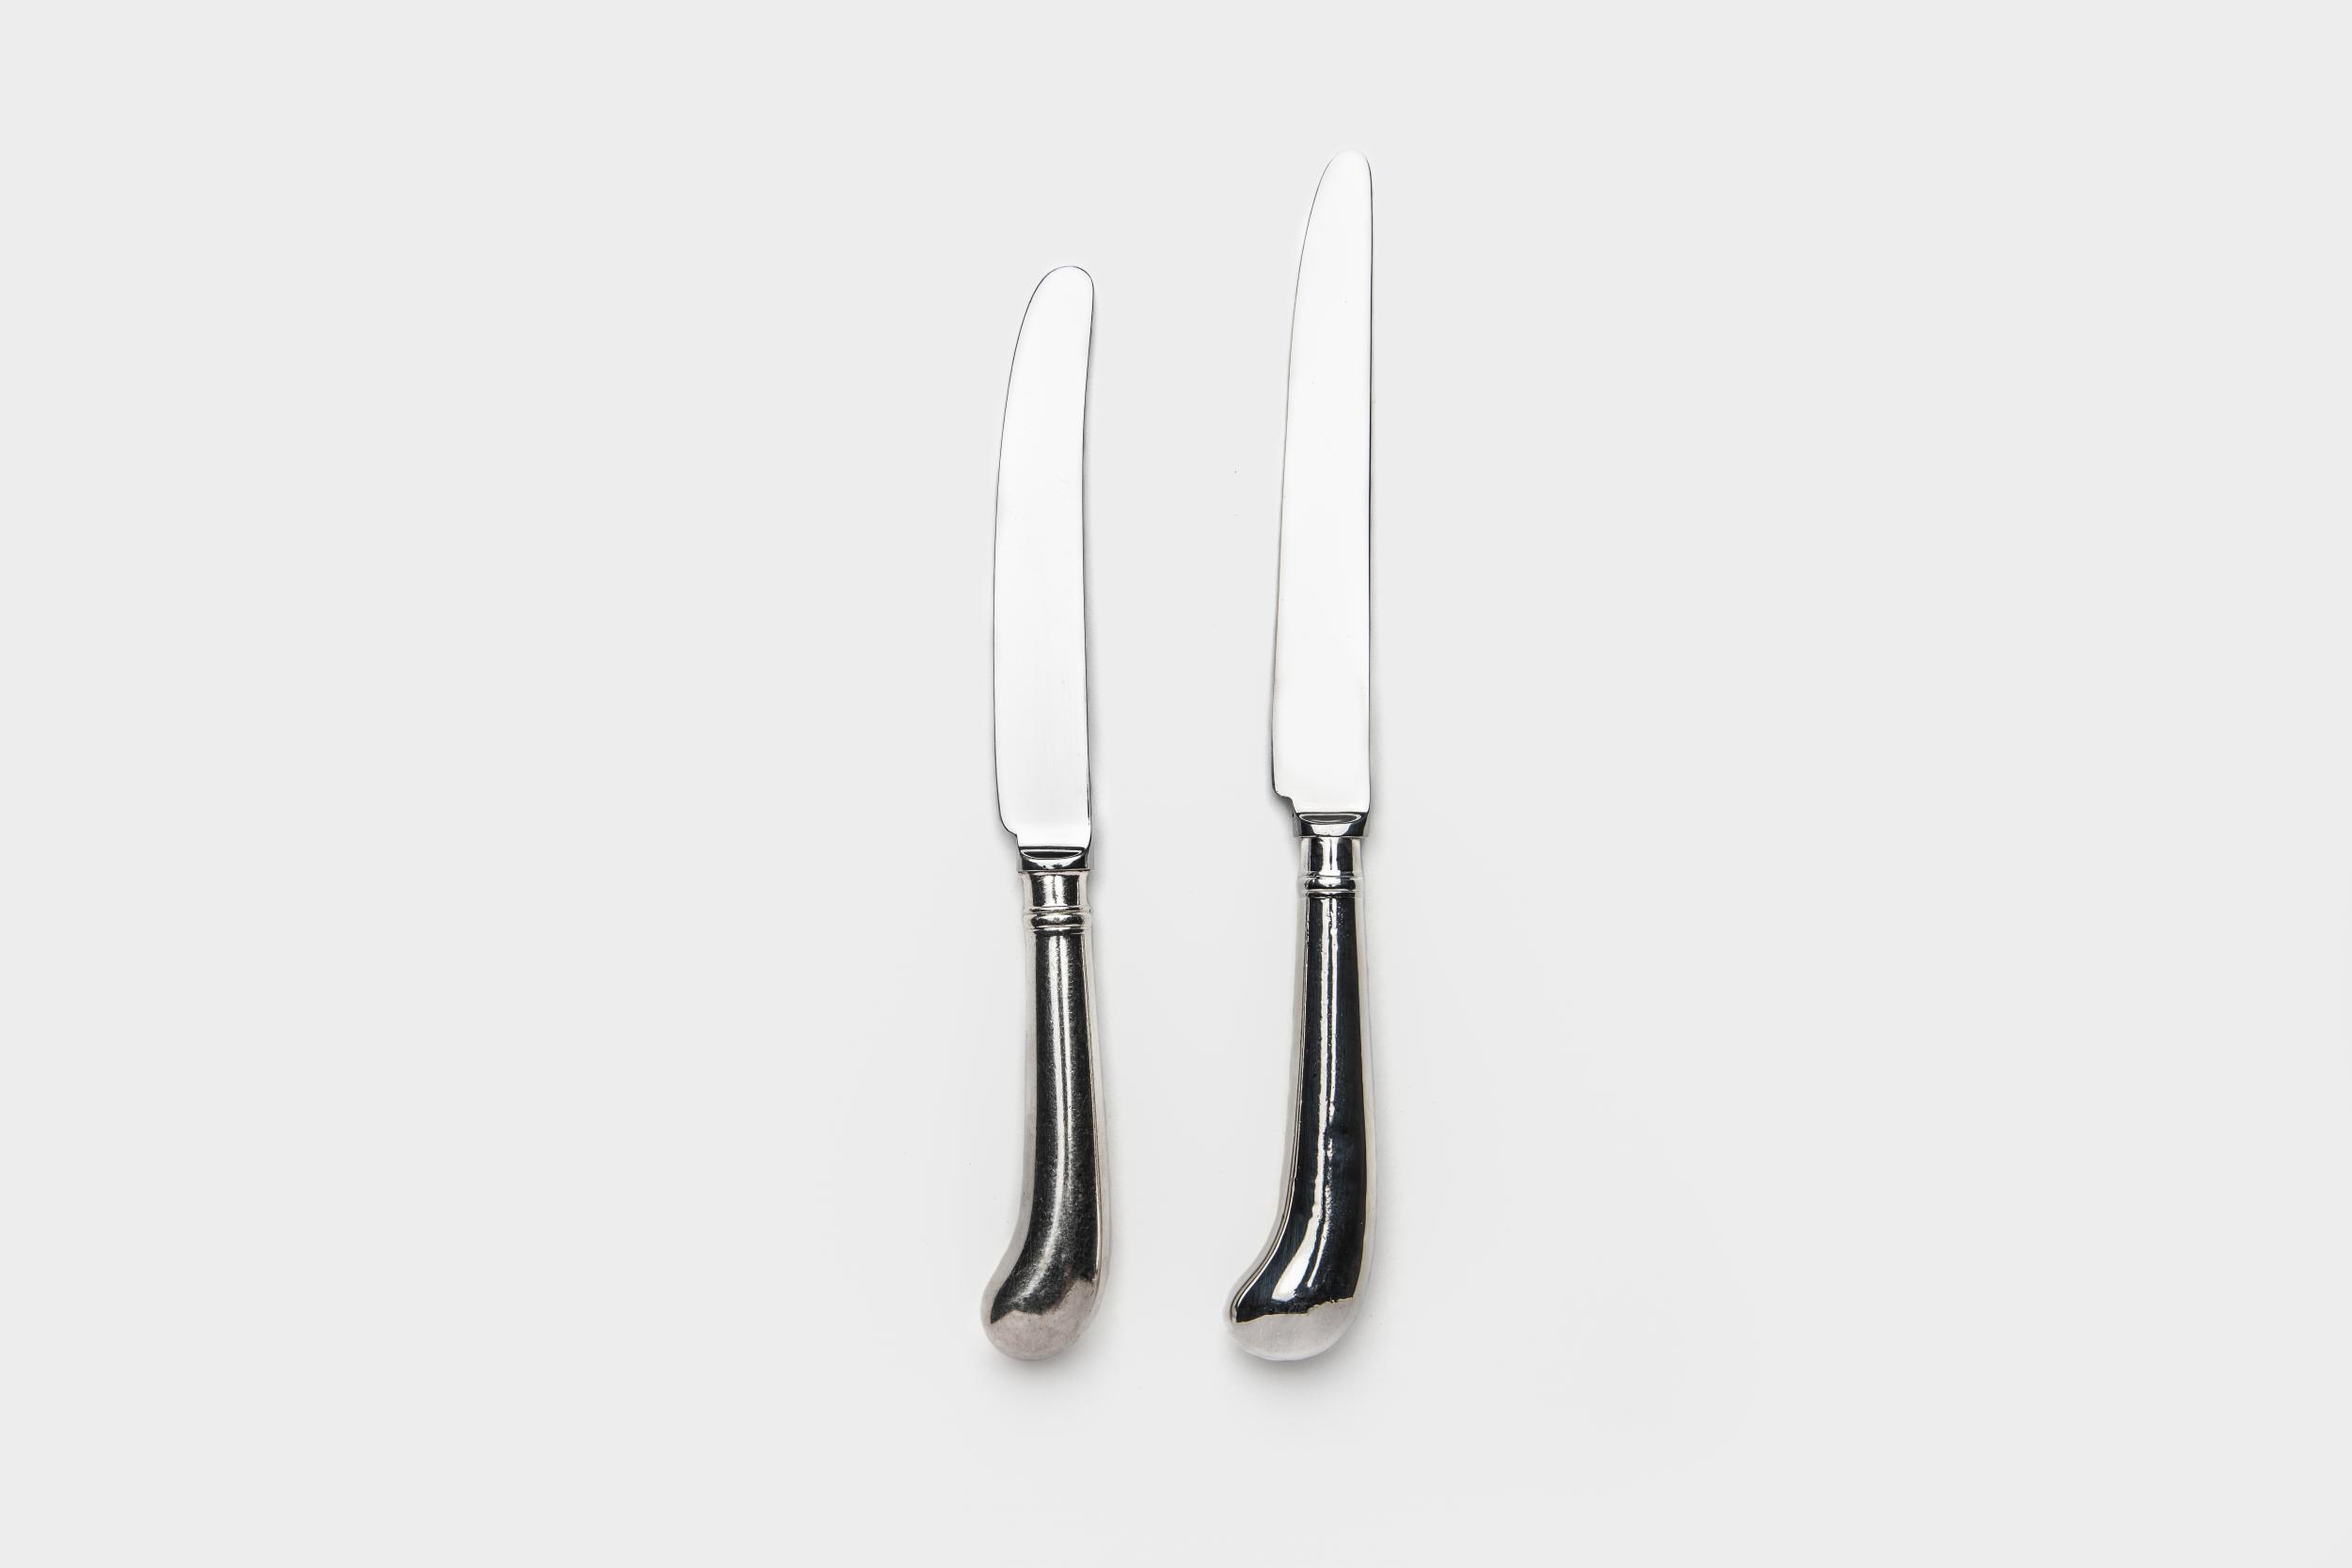 Pistol knives - Image 0